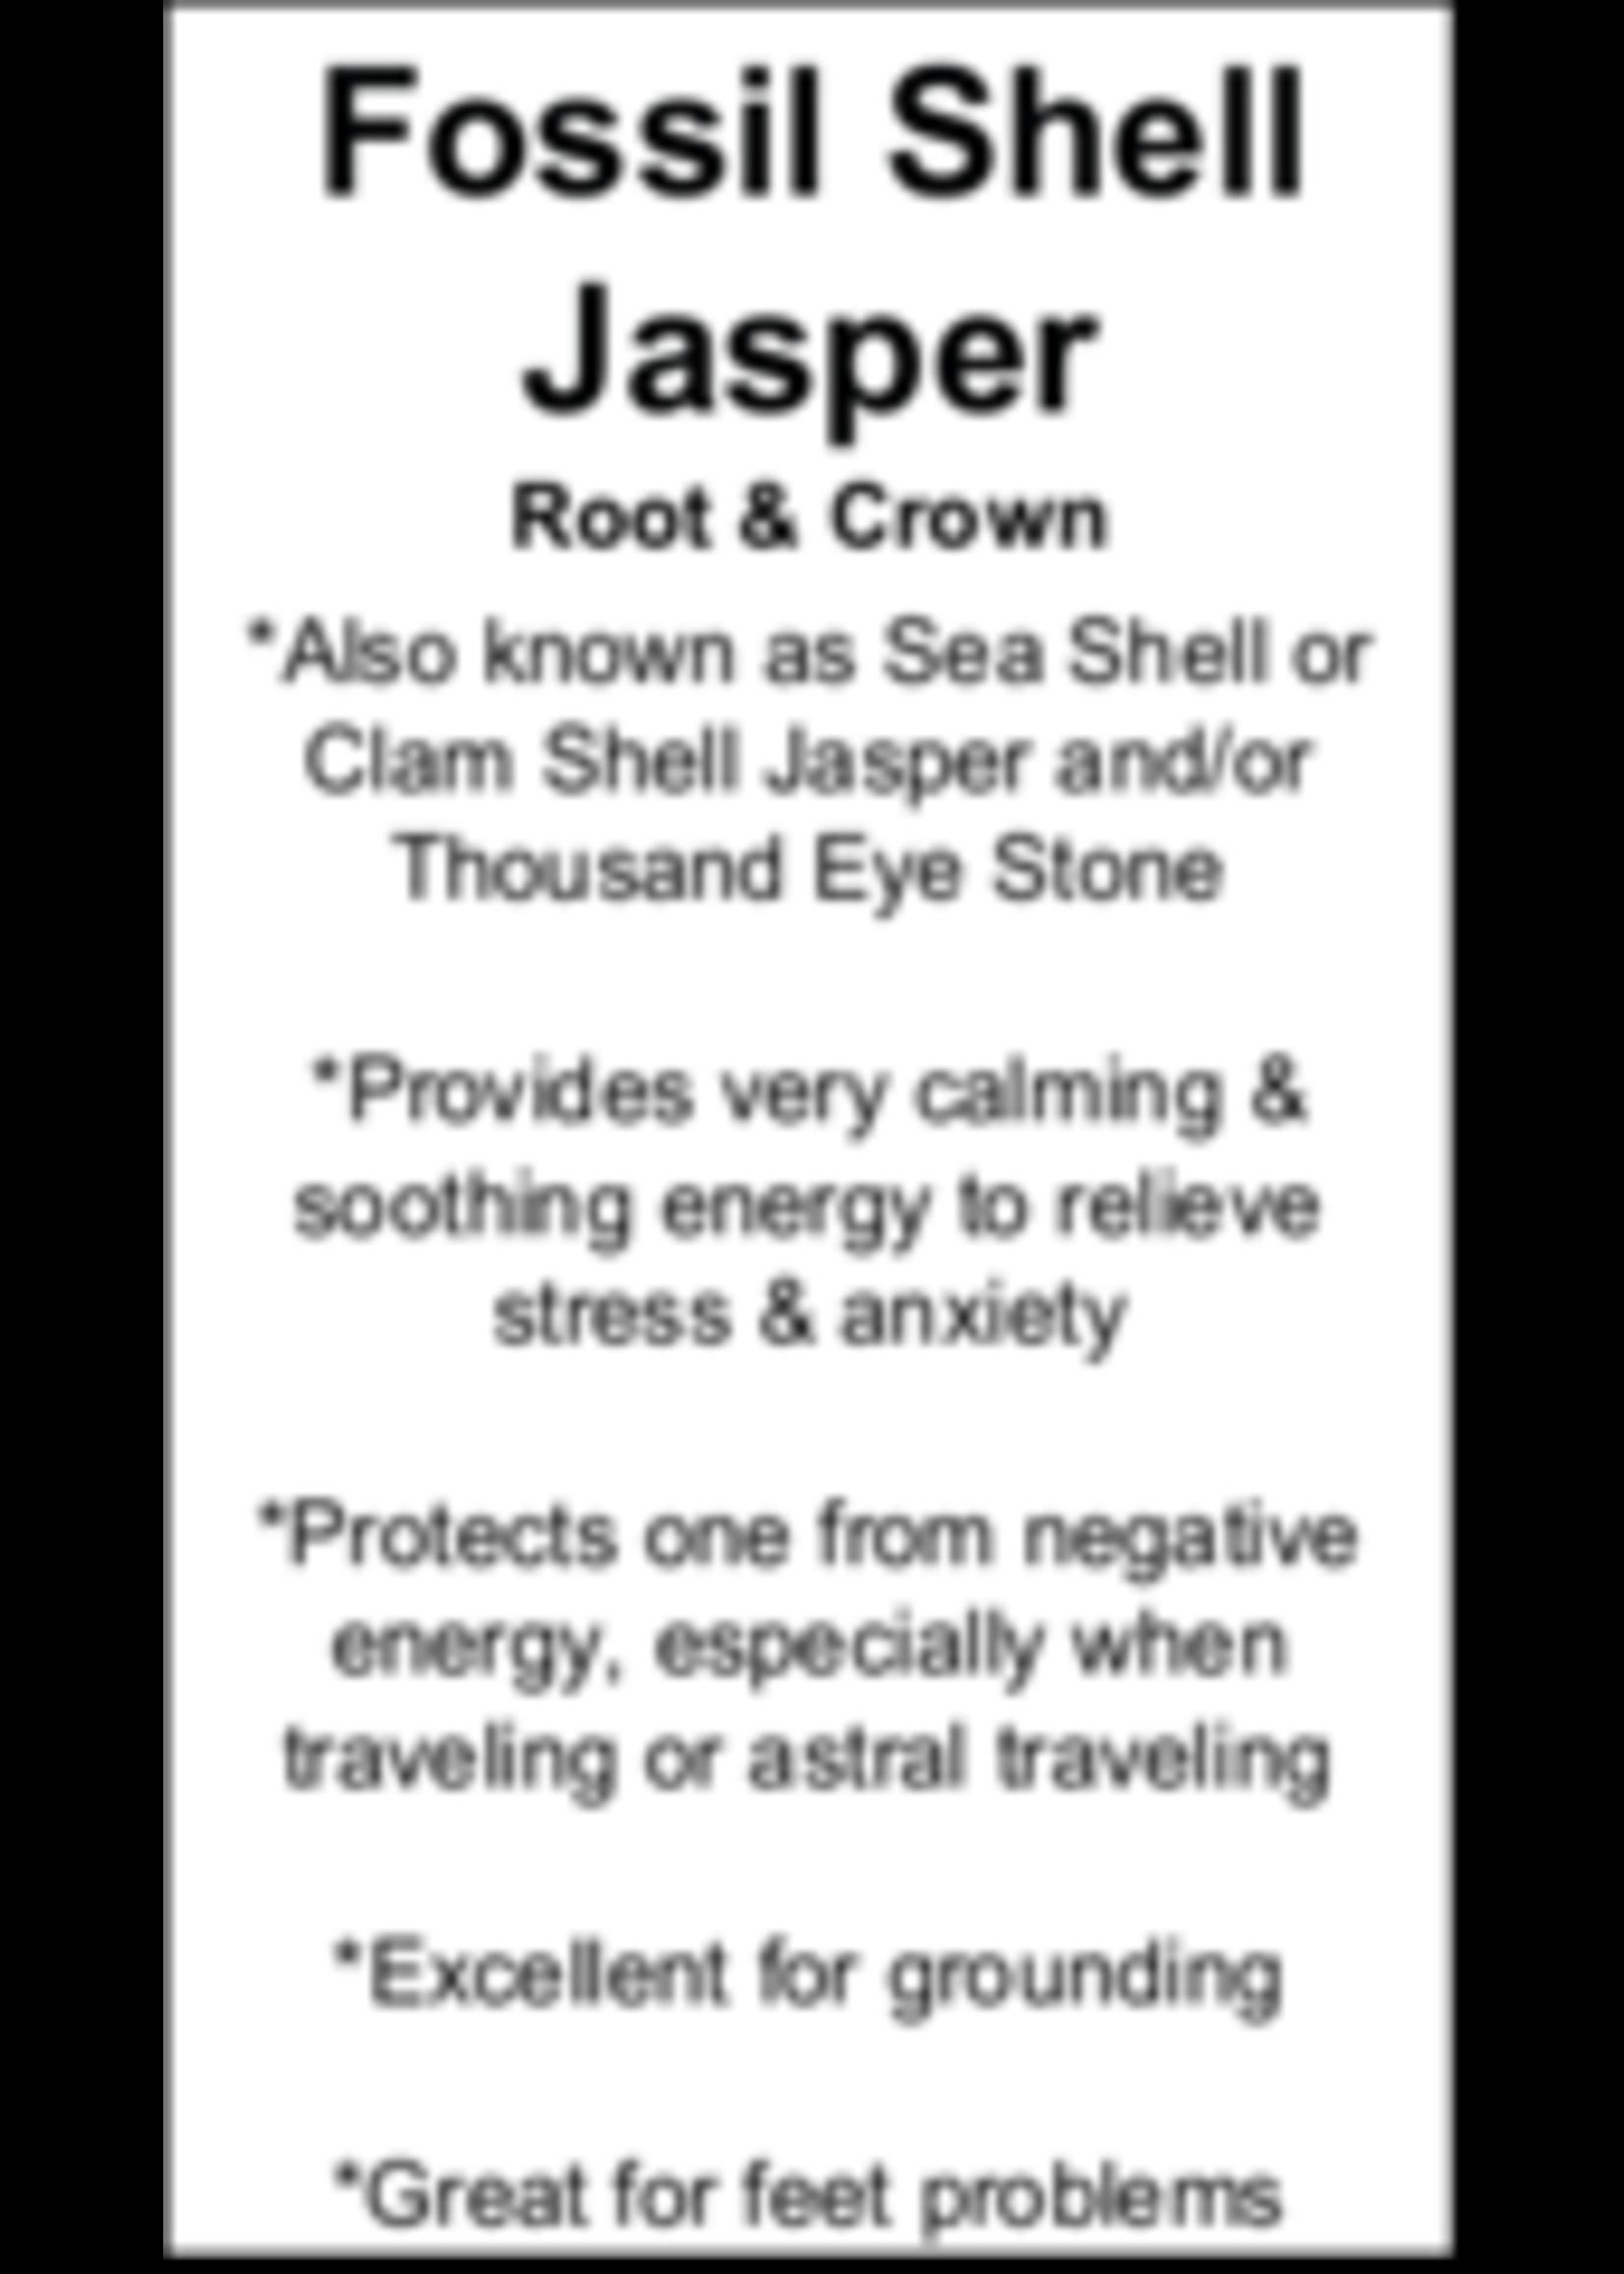 Fossil Shell Jasper Cards - Box of 250